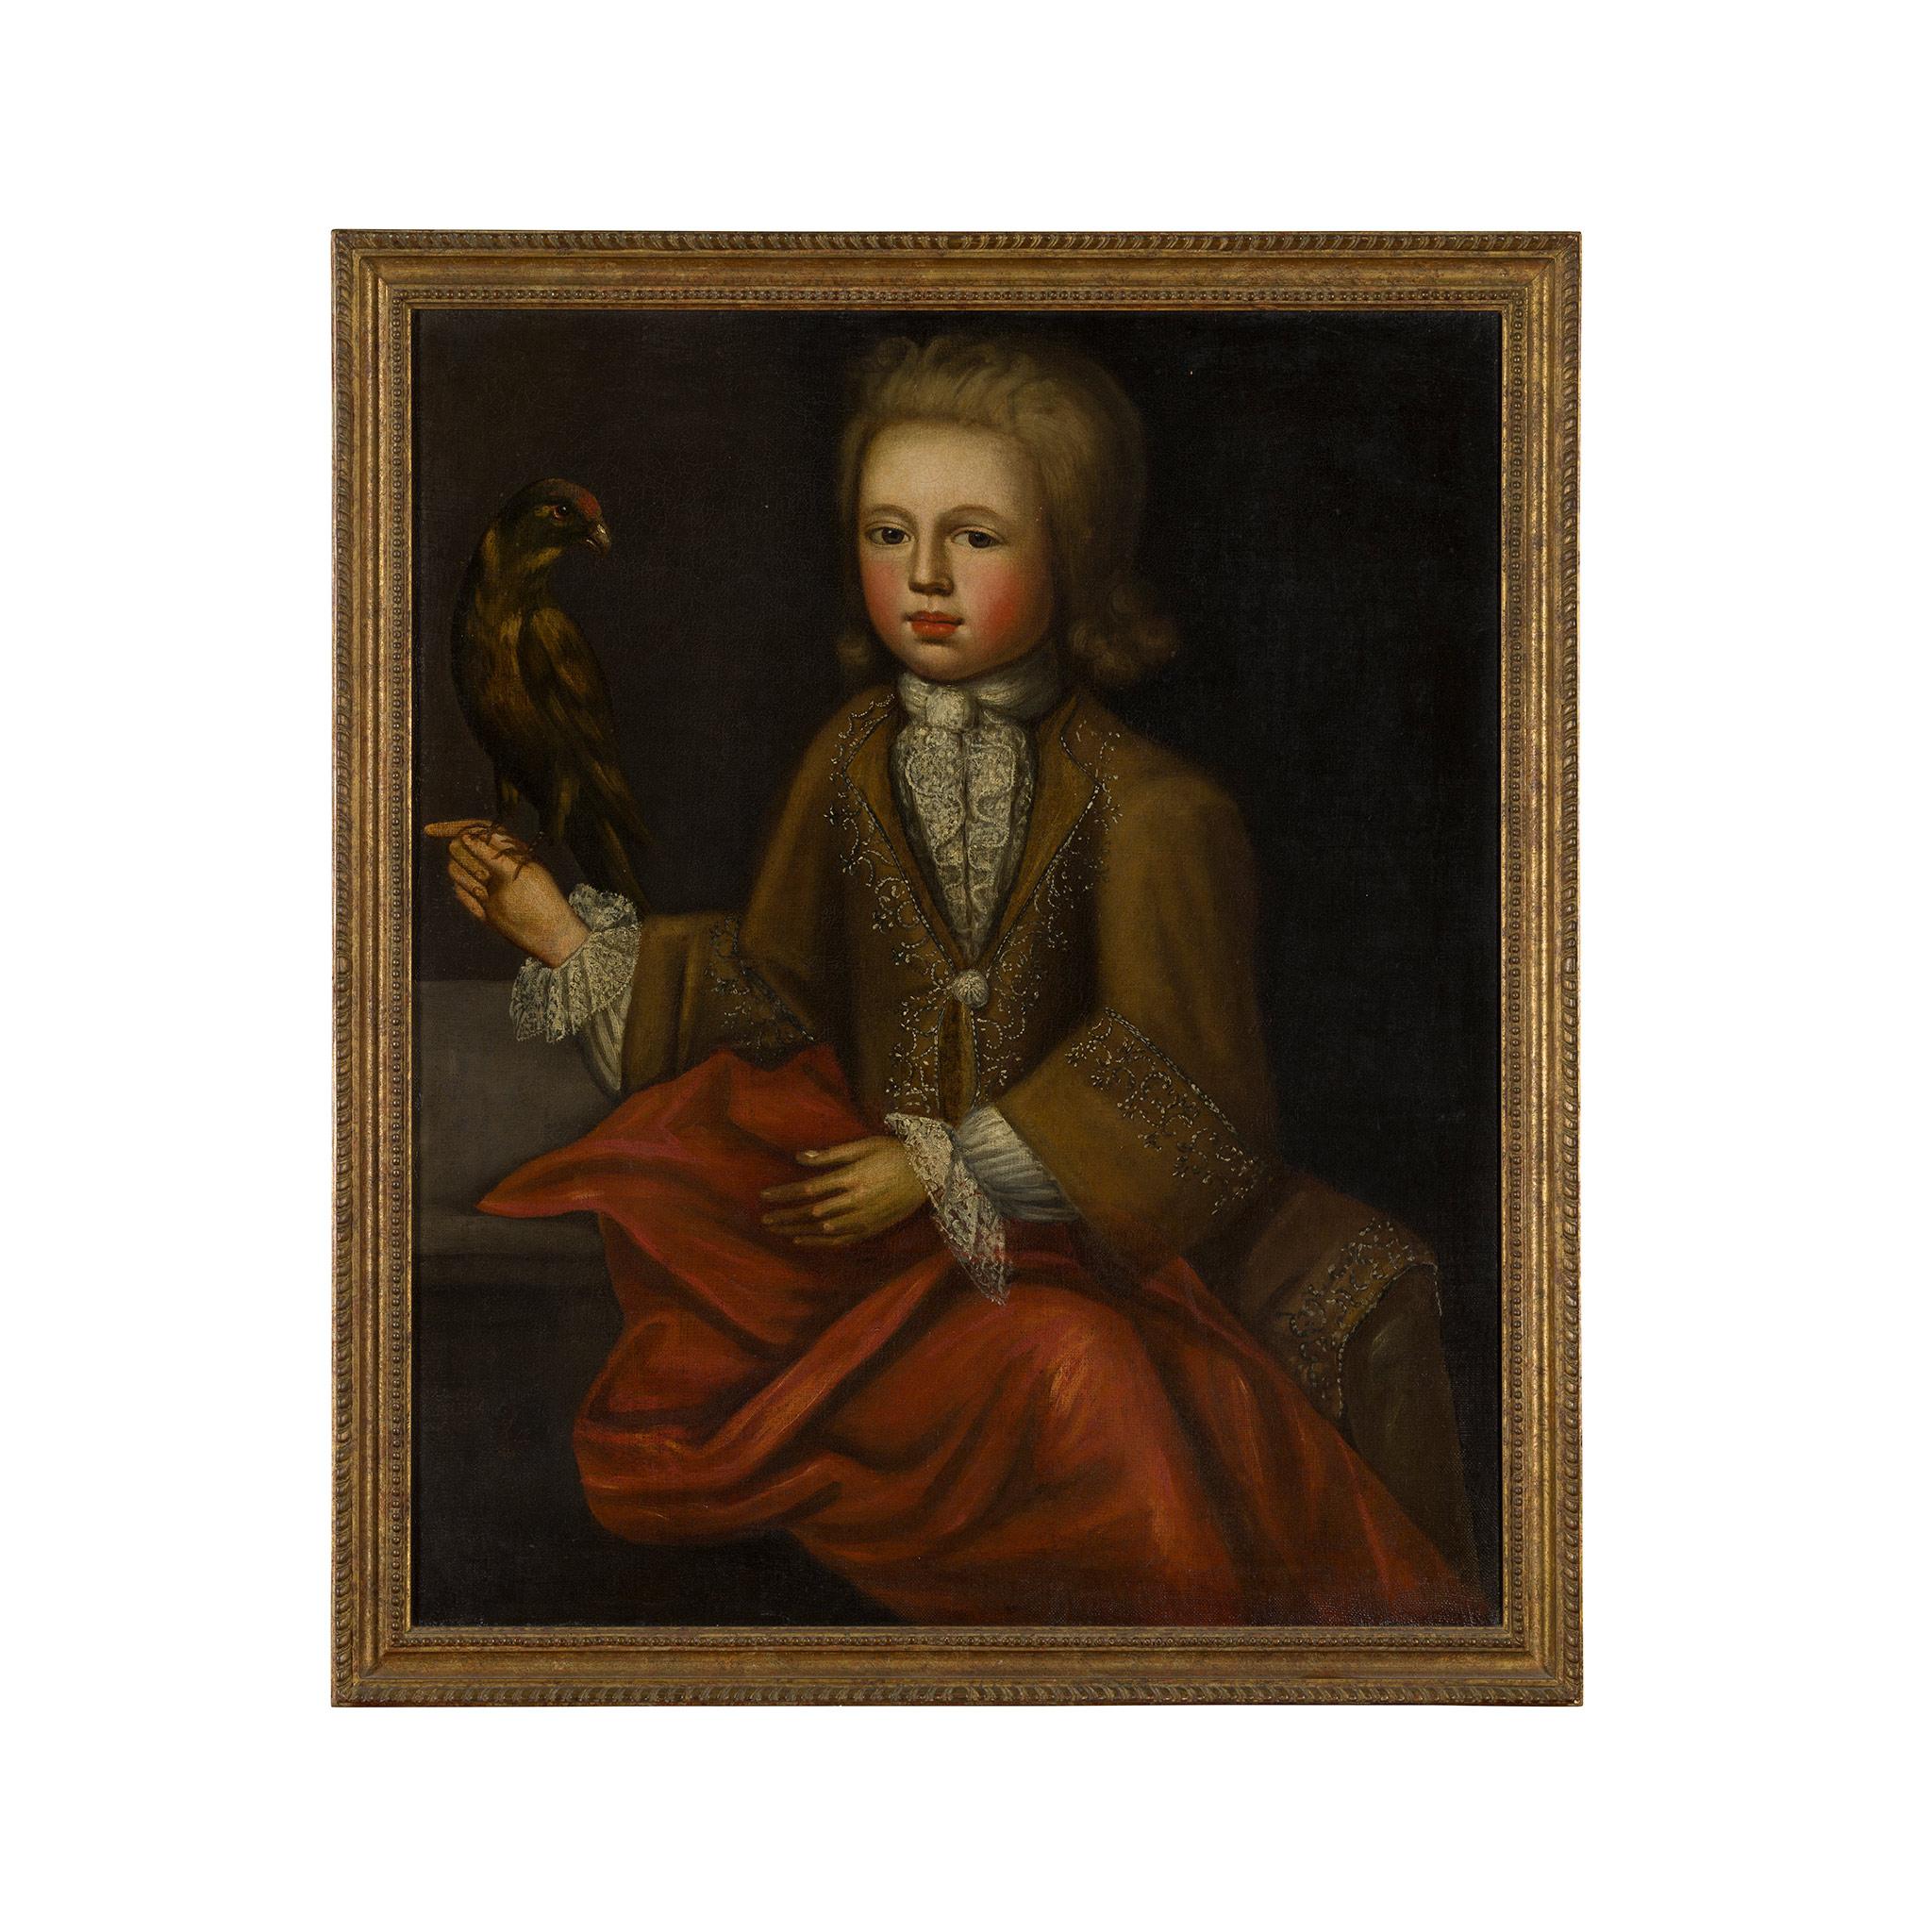 18TH CENTURY ENGLISH SCHOOL HALF LENGTH PORTRAIT OF A BOY WITH A BIRD - Image 2 of 2